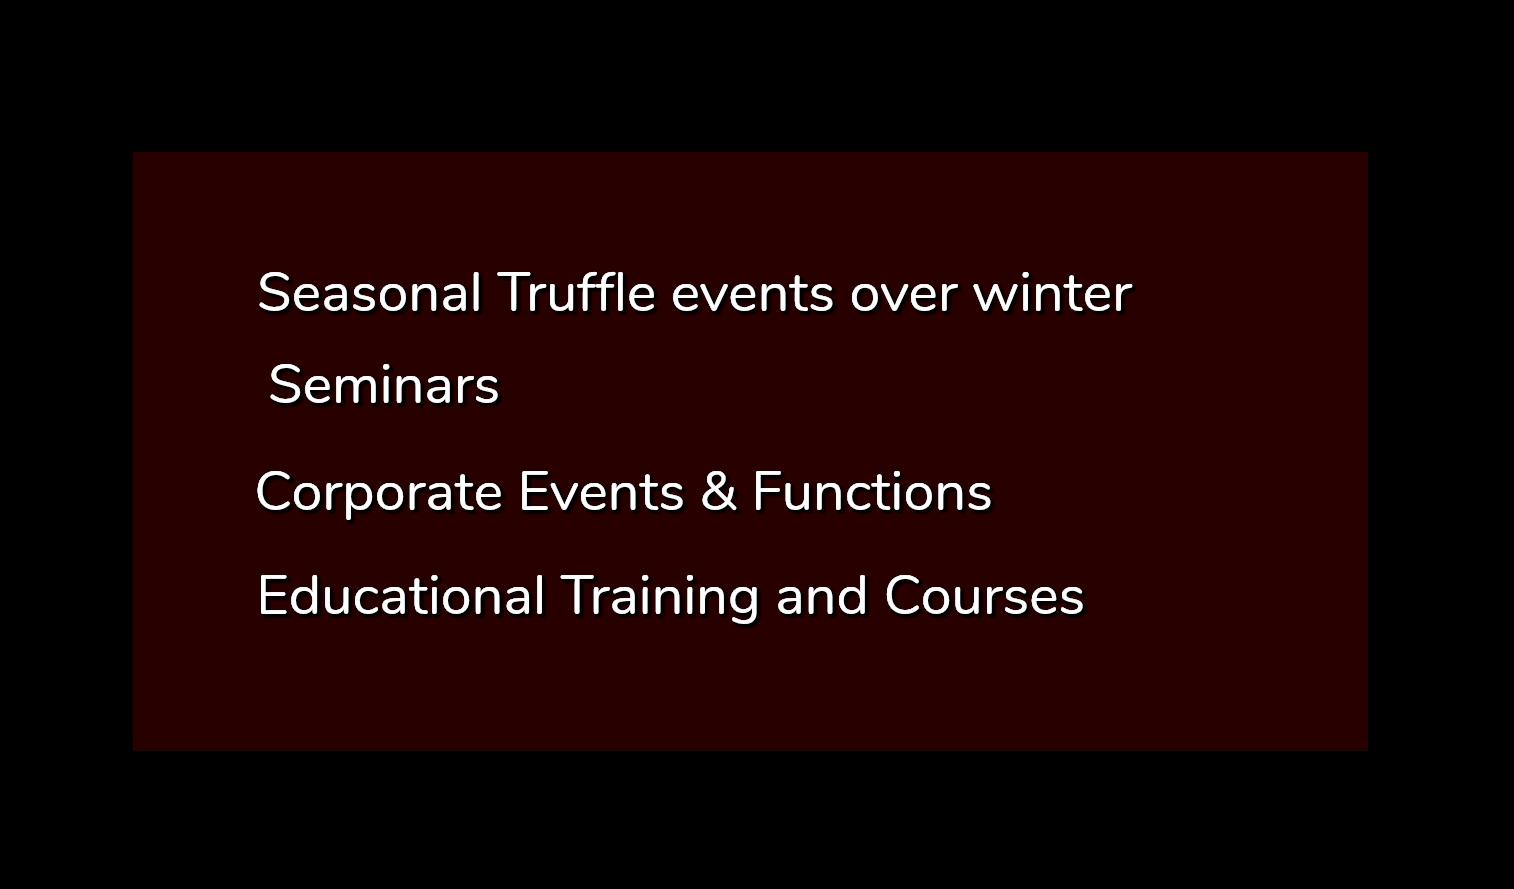 mast truffle seminars.png